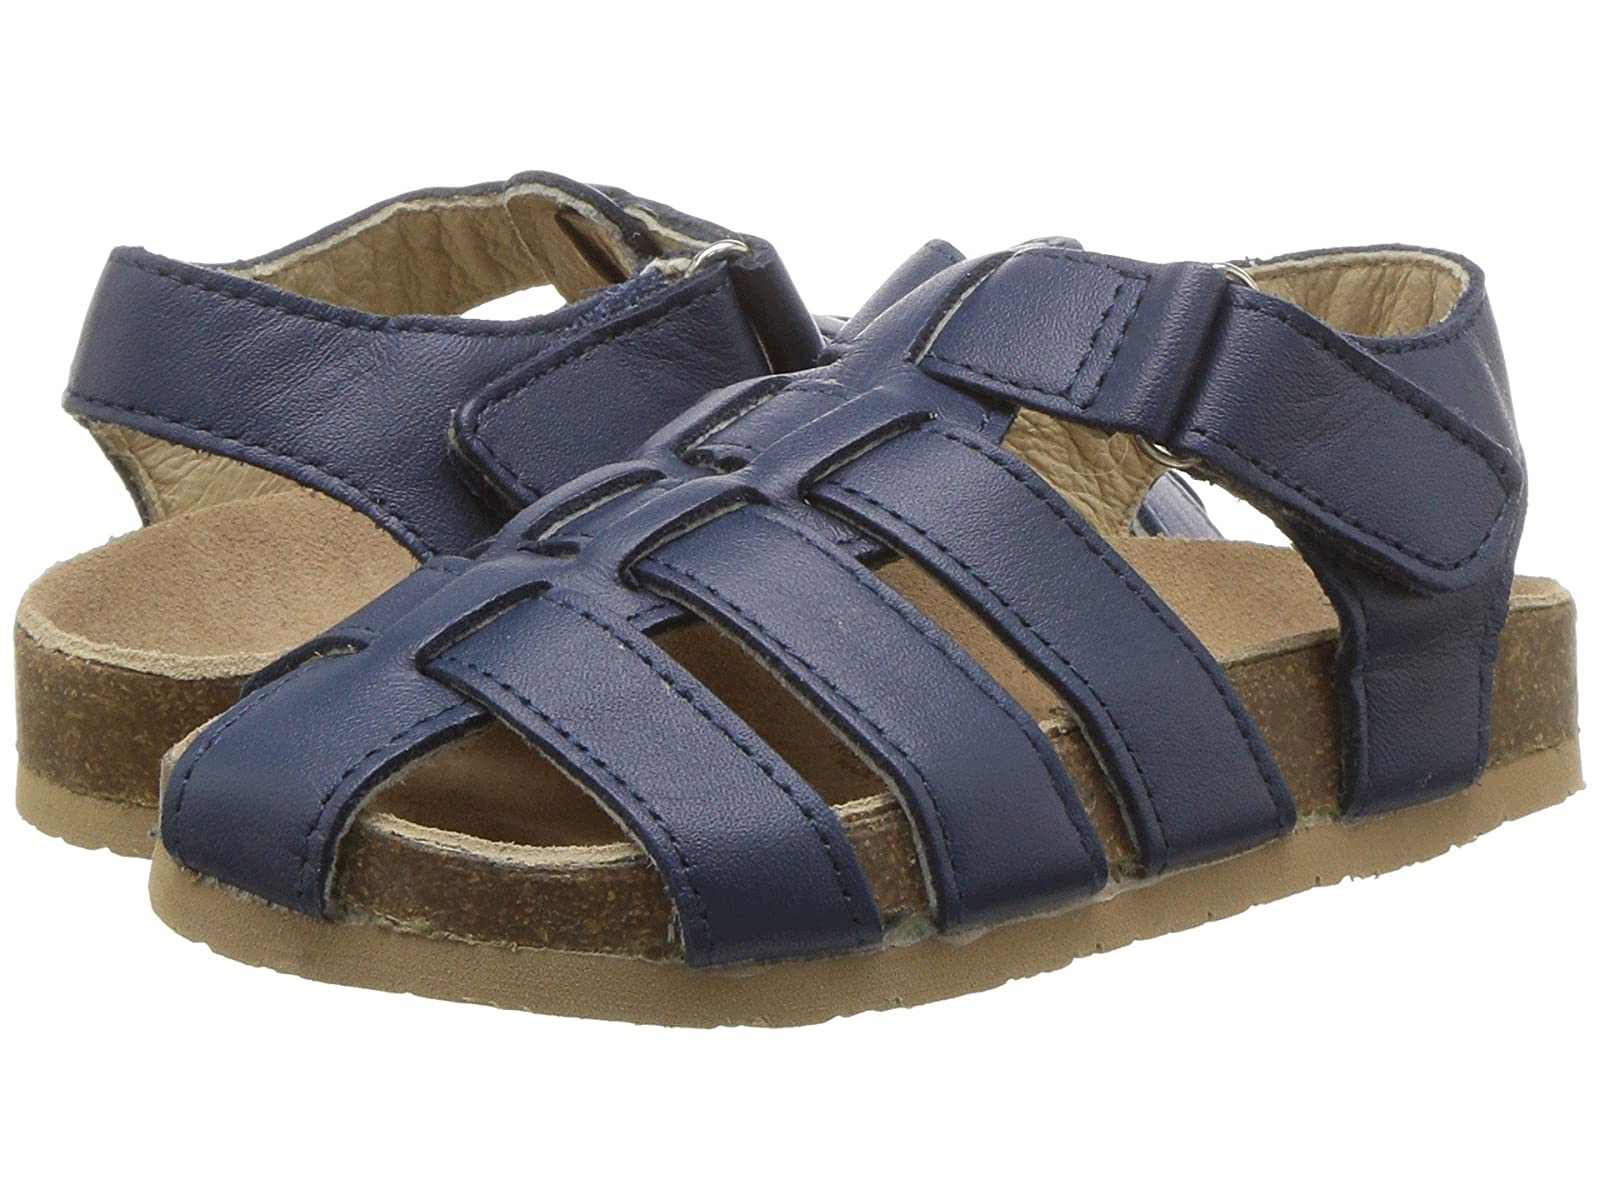 Old Soles Roadstar (Toddler/Little Kid)Atmospheric grades have affordable shoes